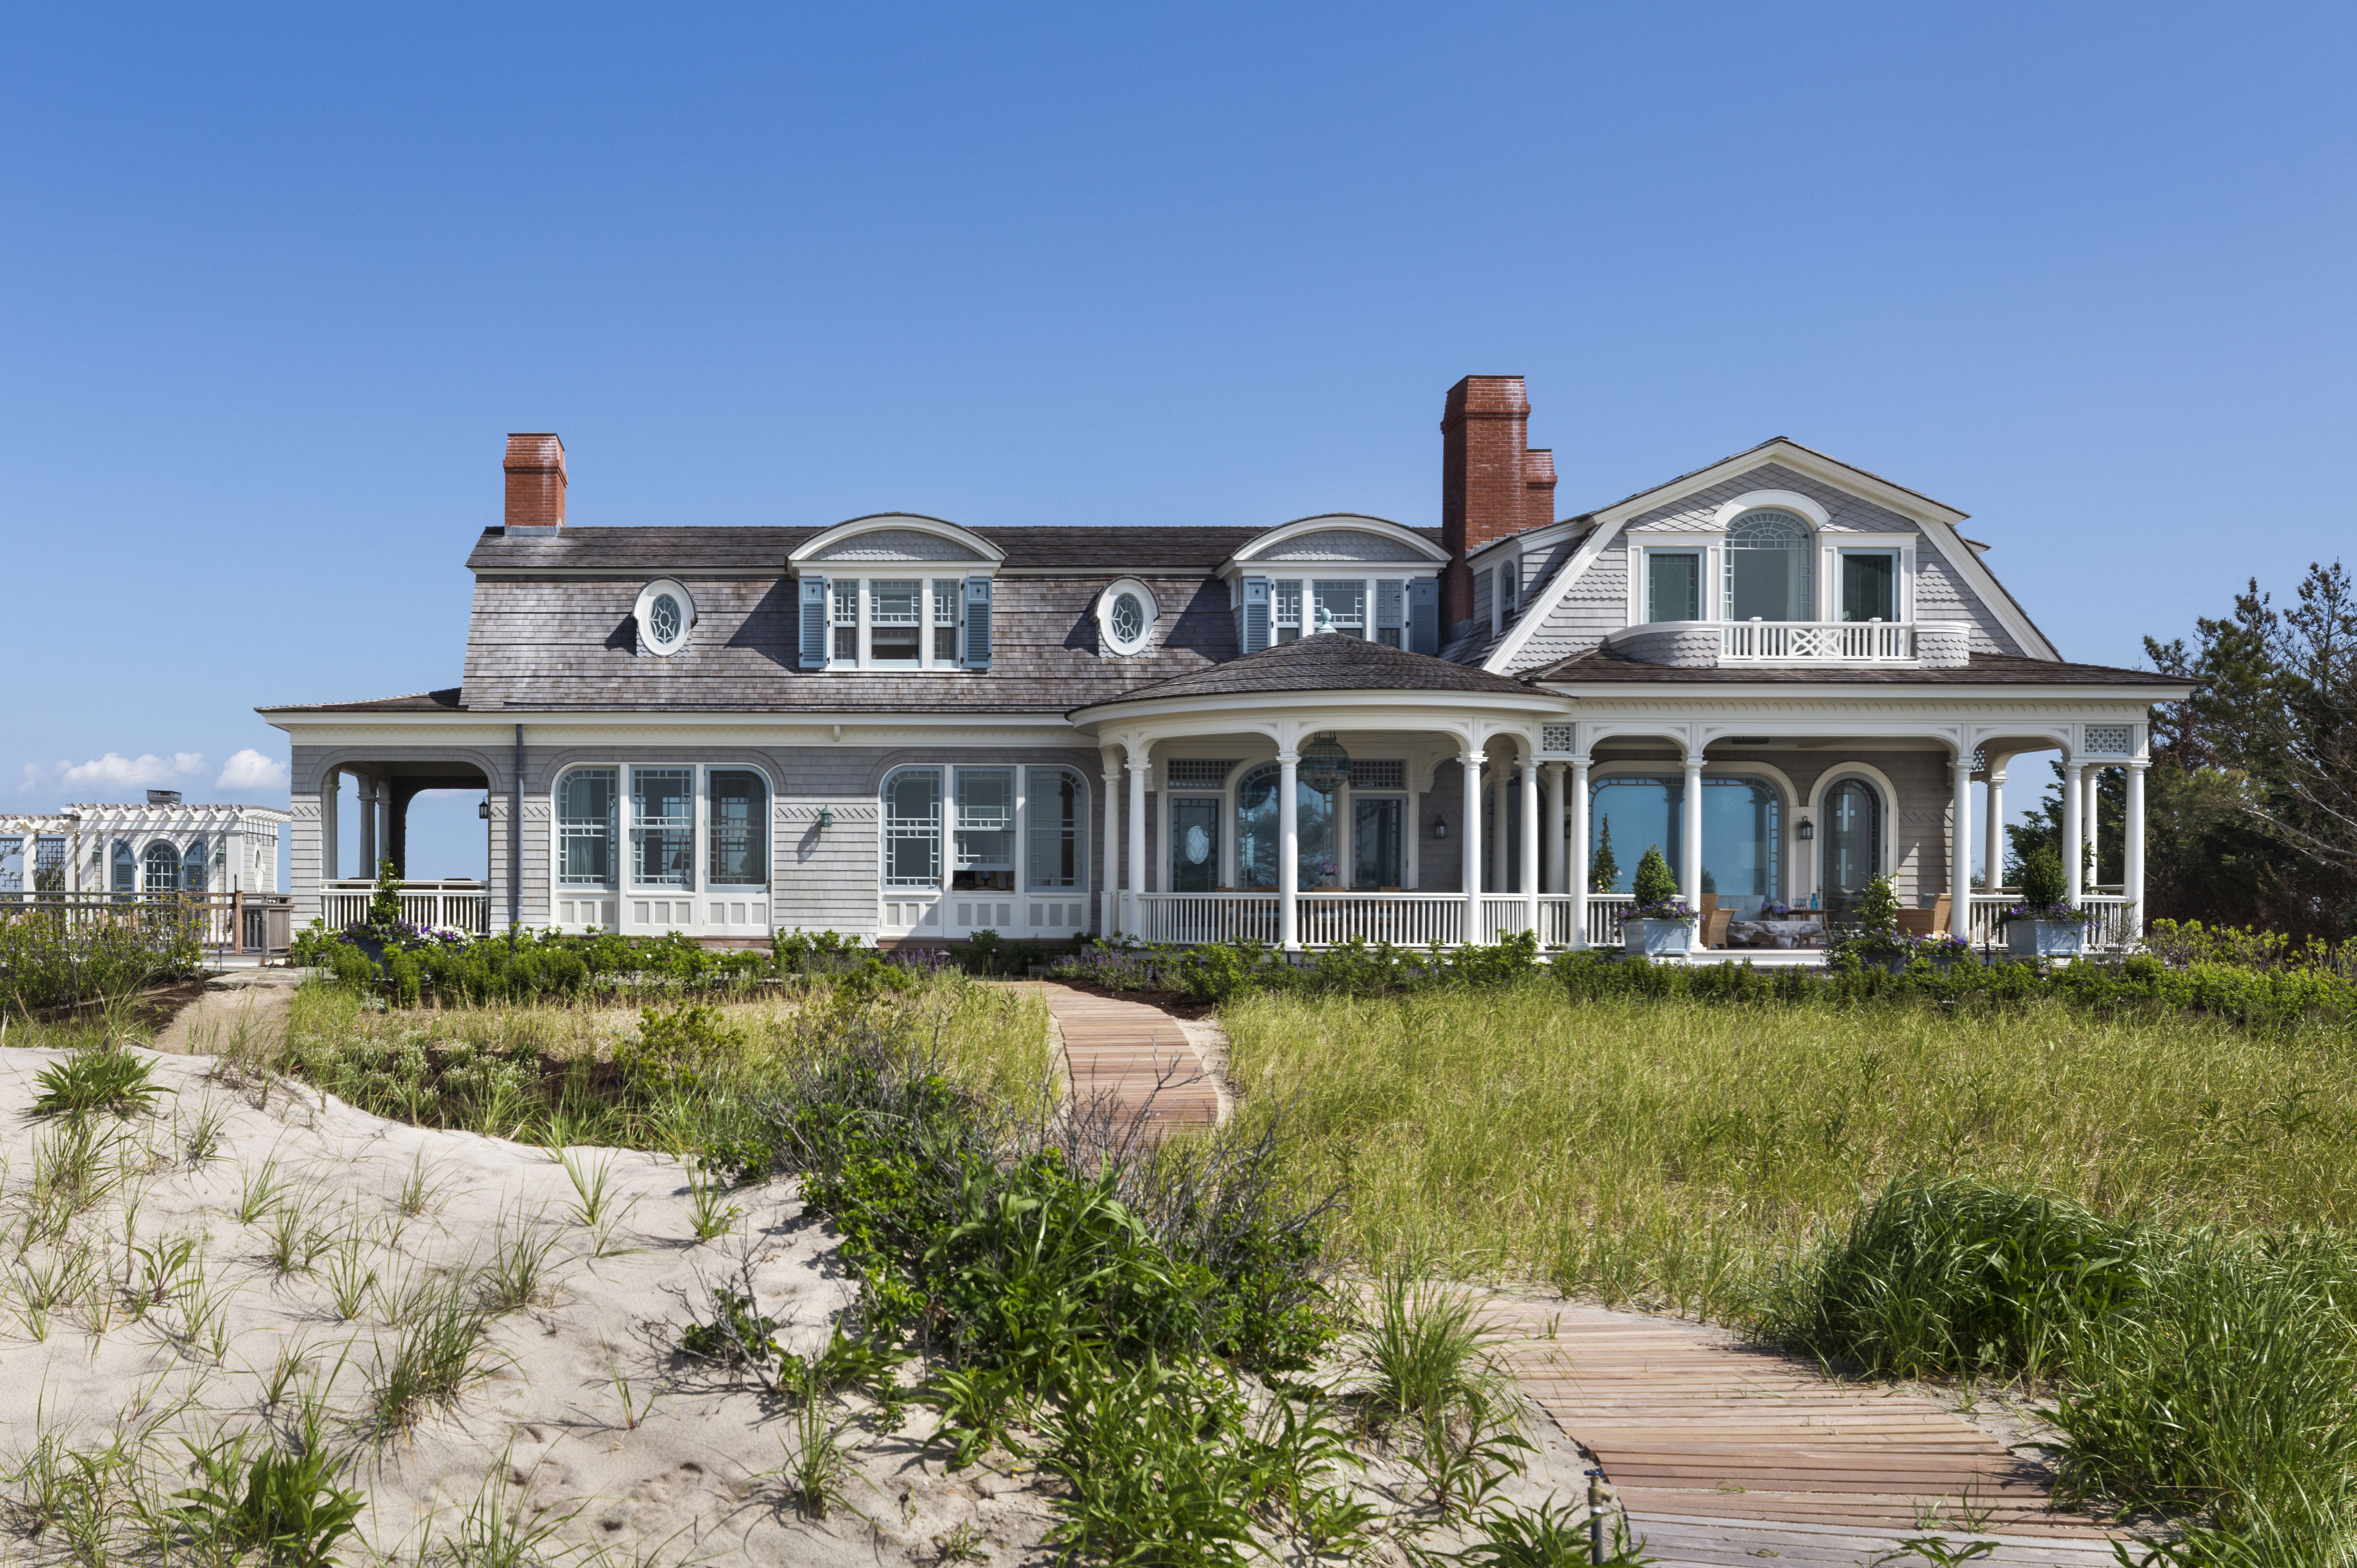 East Quogue beach house